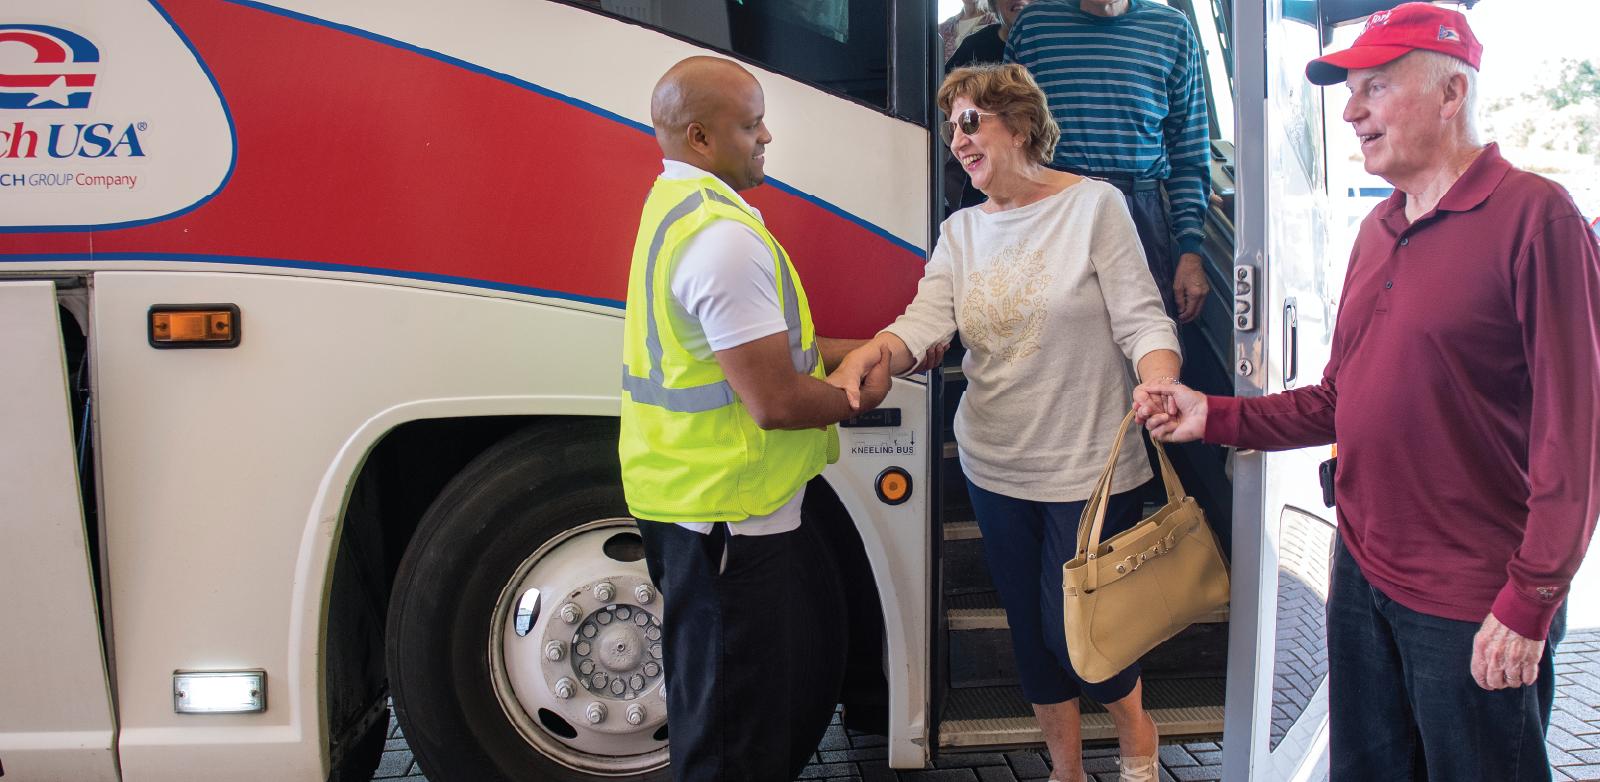 Visitors arriving to Hartville Kitchen on a tour bus